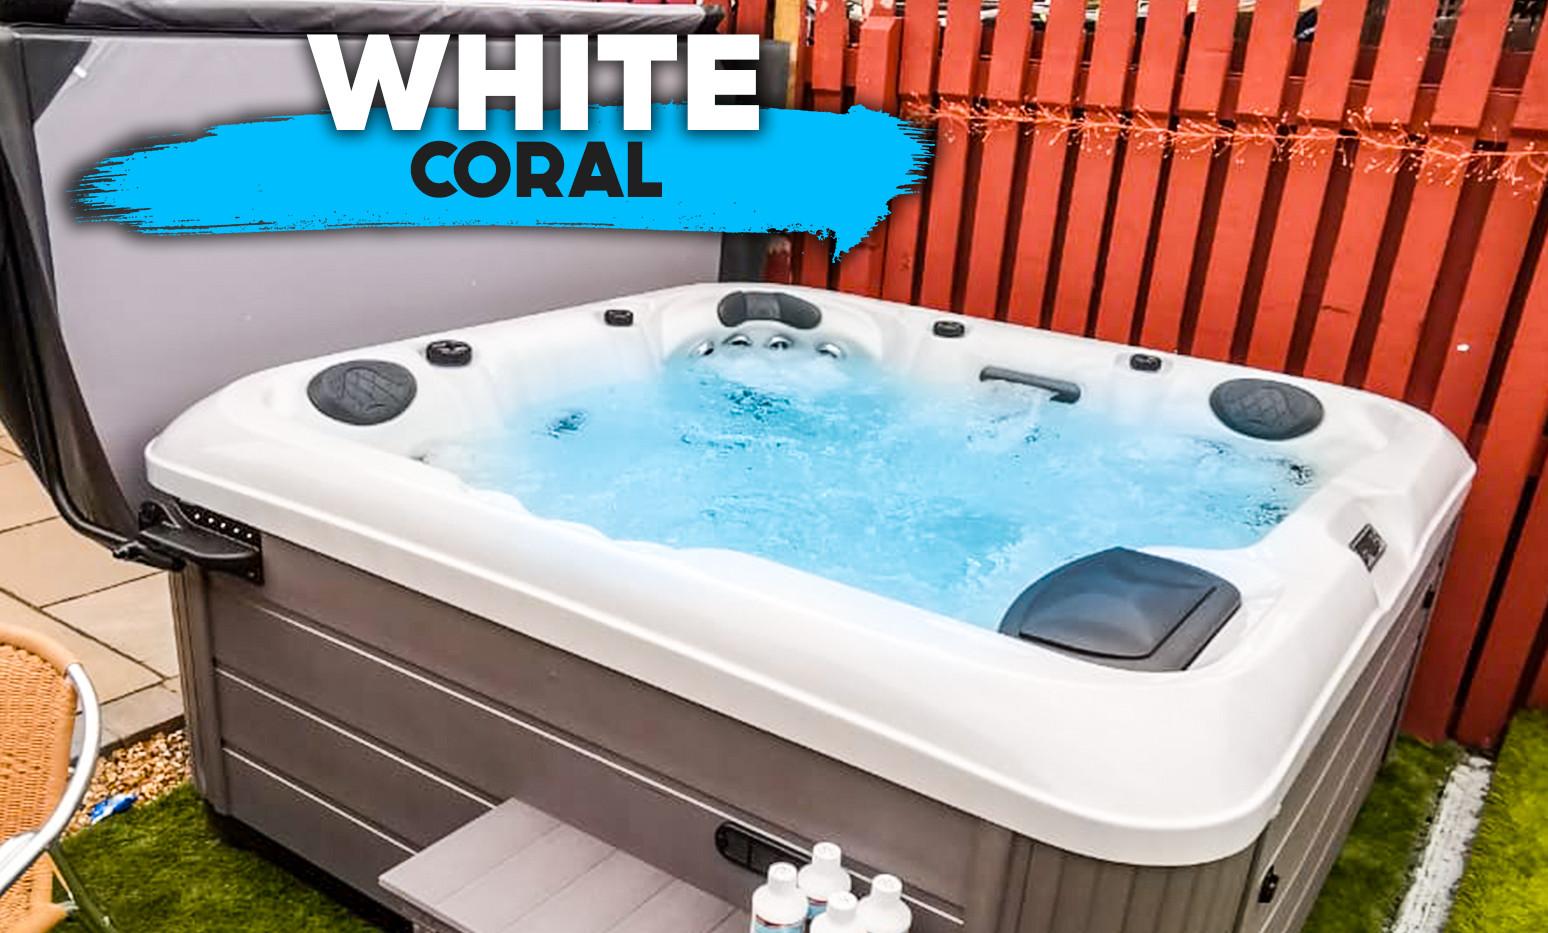 Coral_PreviousInstall_WHITE.jpg